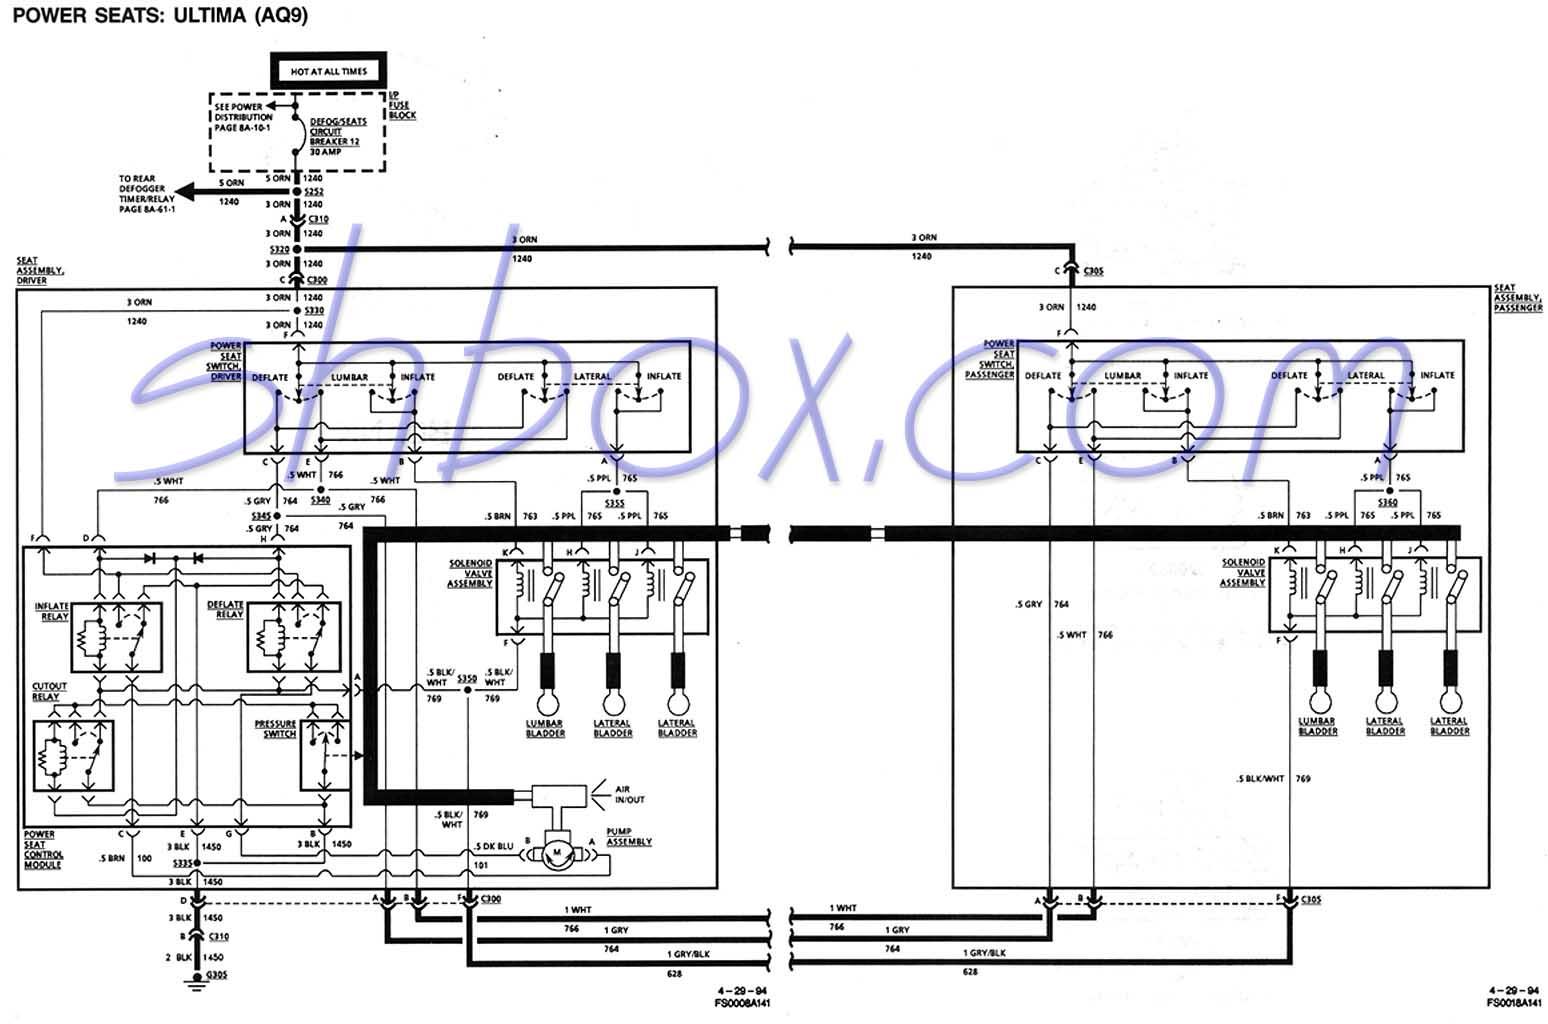 Remarkable Fuse Diagram 2000 Pontiac Tran Am Wiring Diagram Wiring Cloud Hisonepsysticxongrecoveryedborg